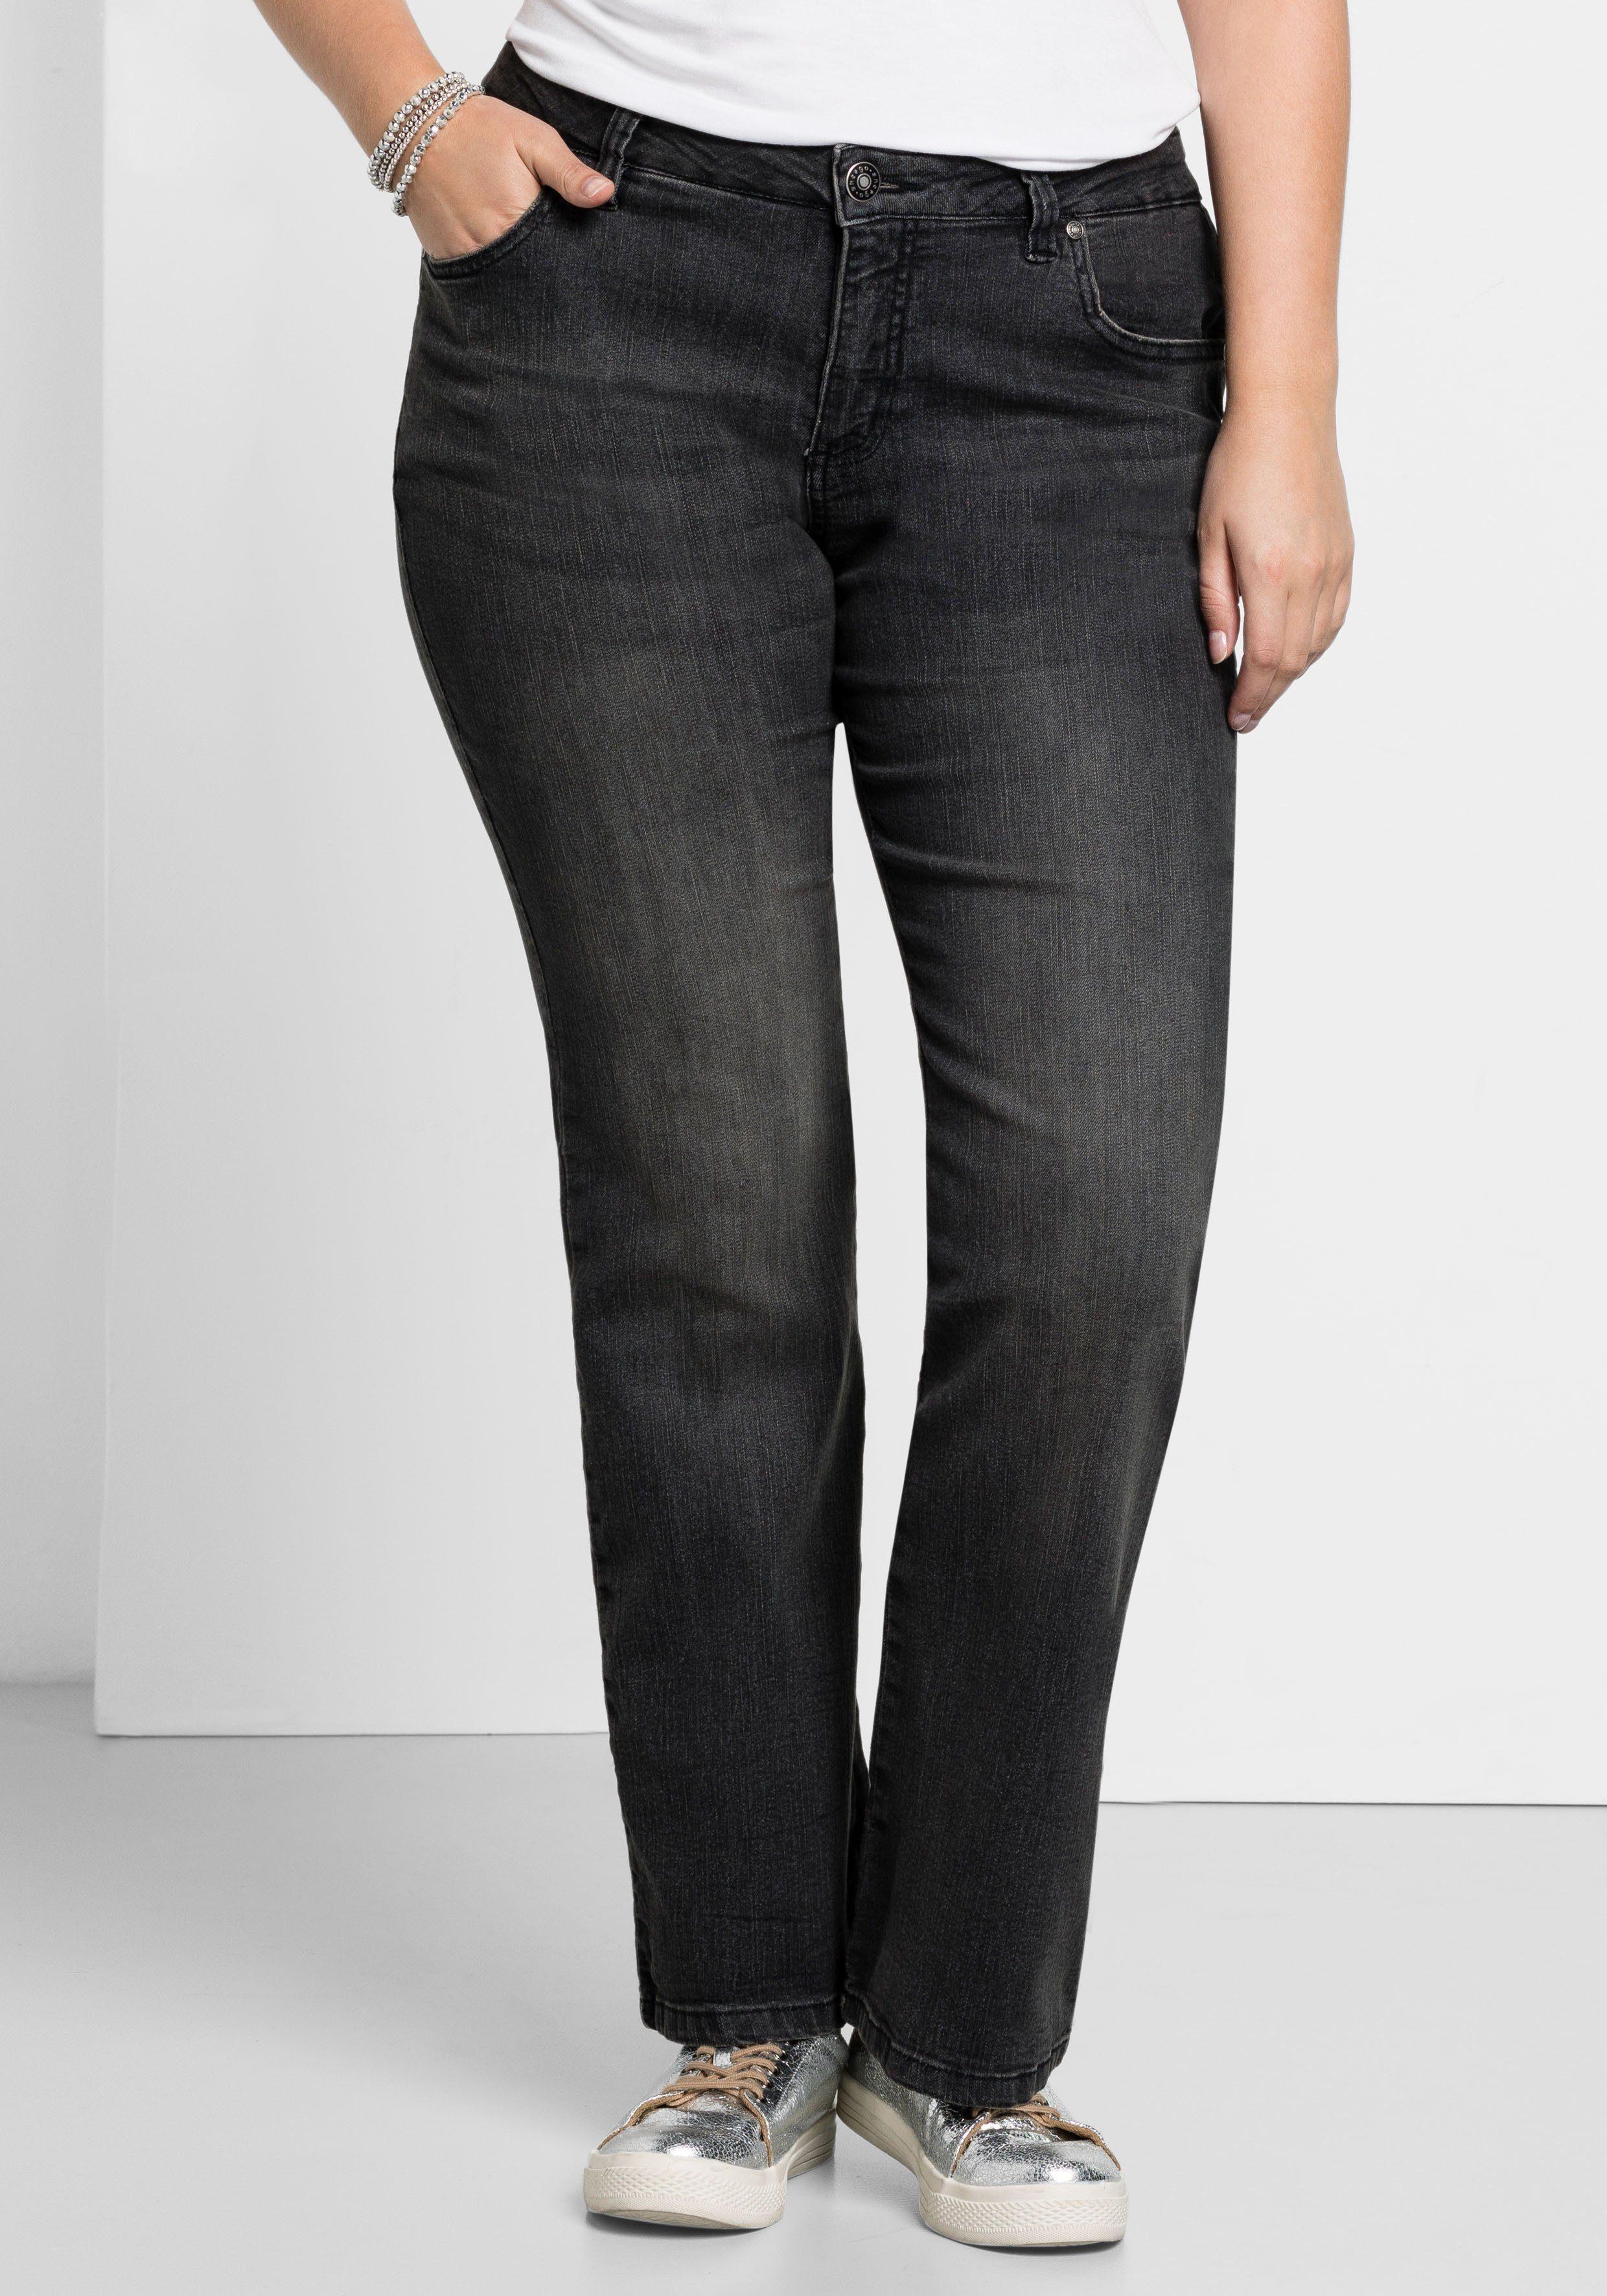 sheego Jeans Maila Bootcut Boot Cut Damen Hose Pants Stretch Denim Kurzgröße